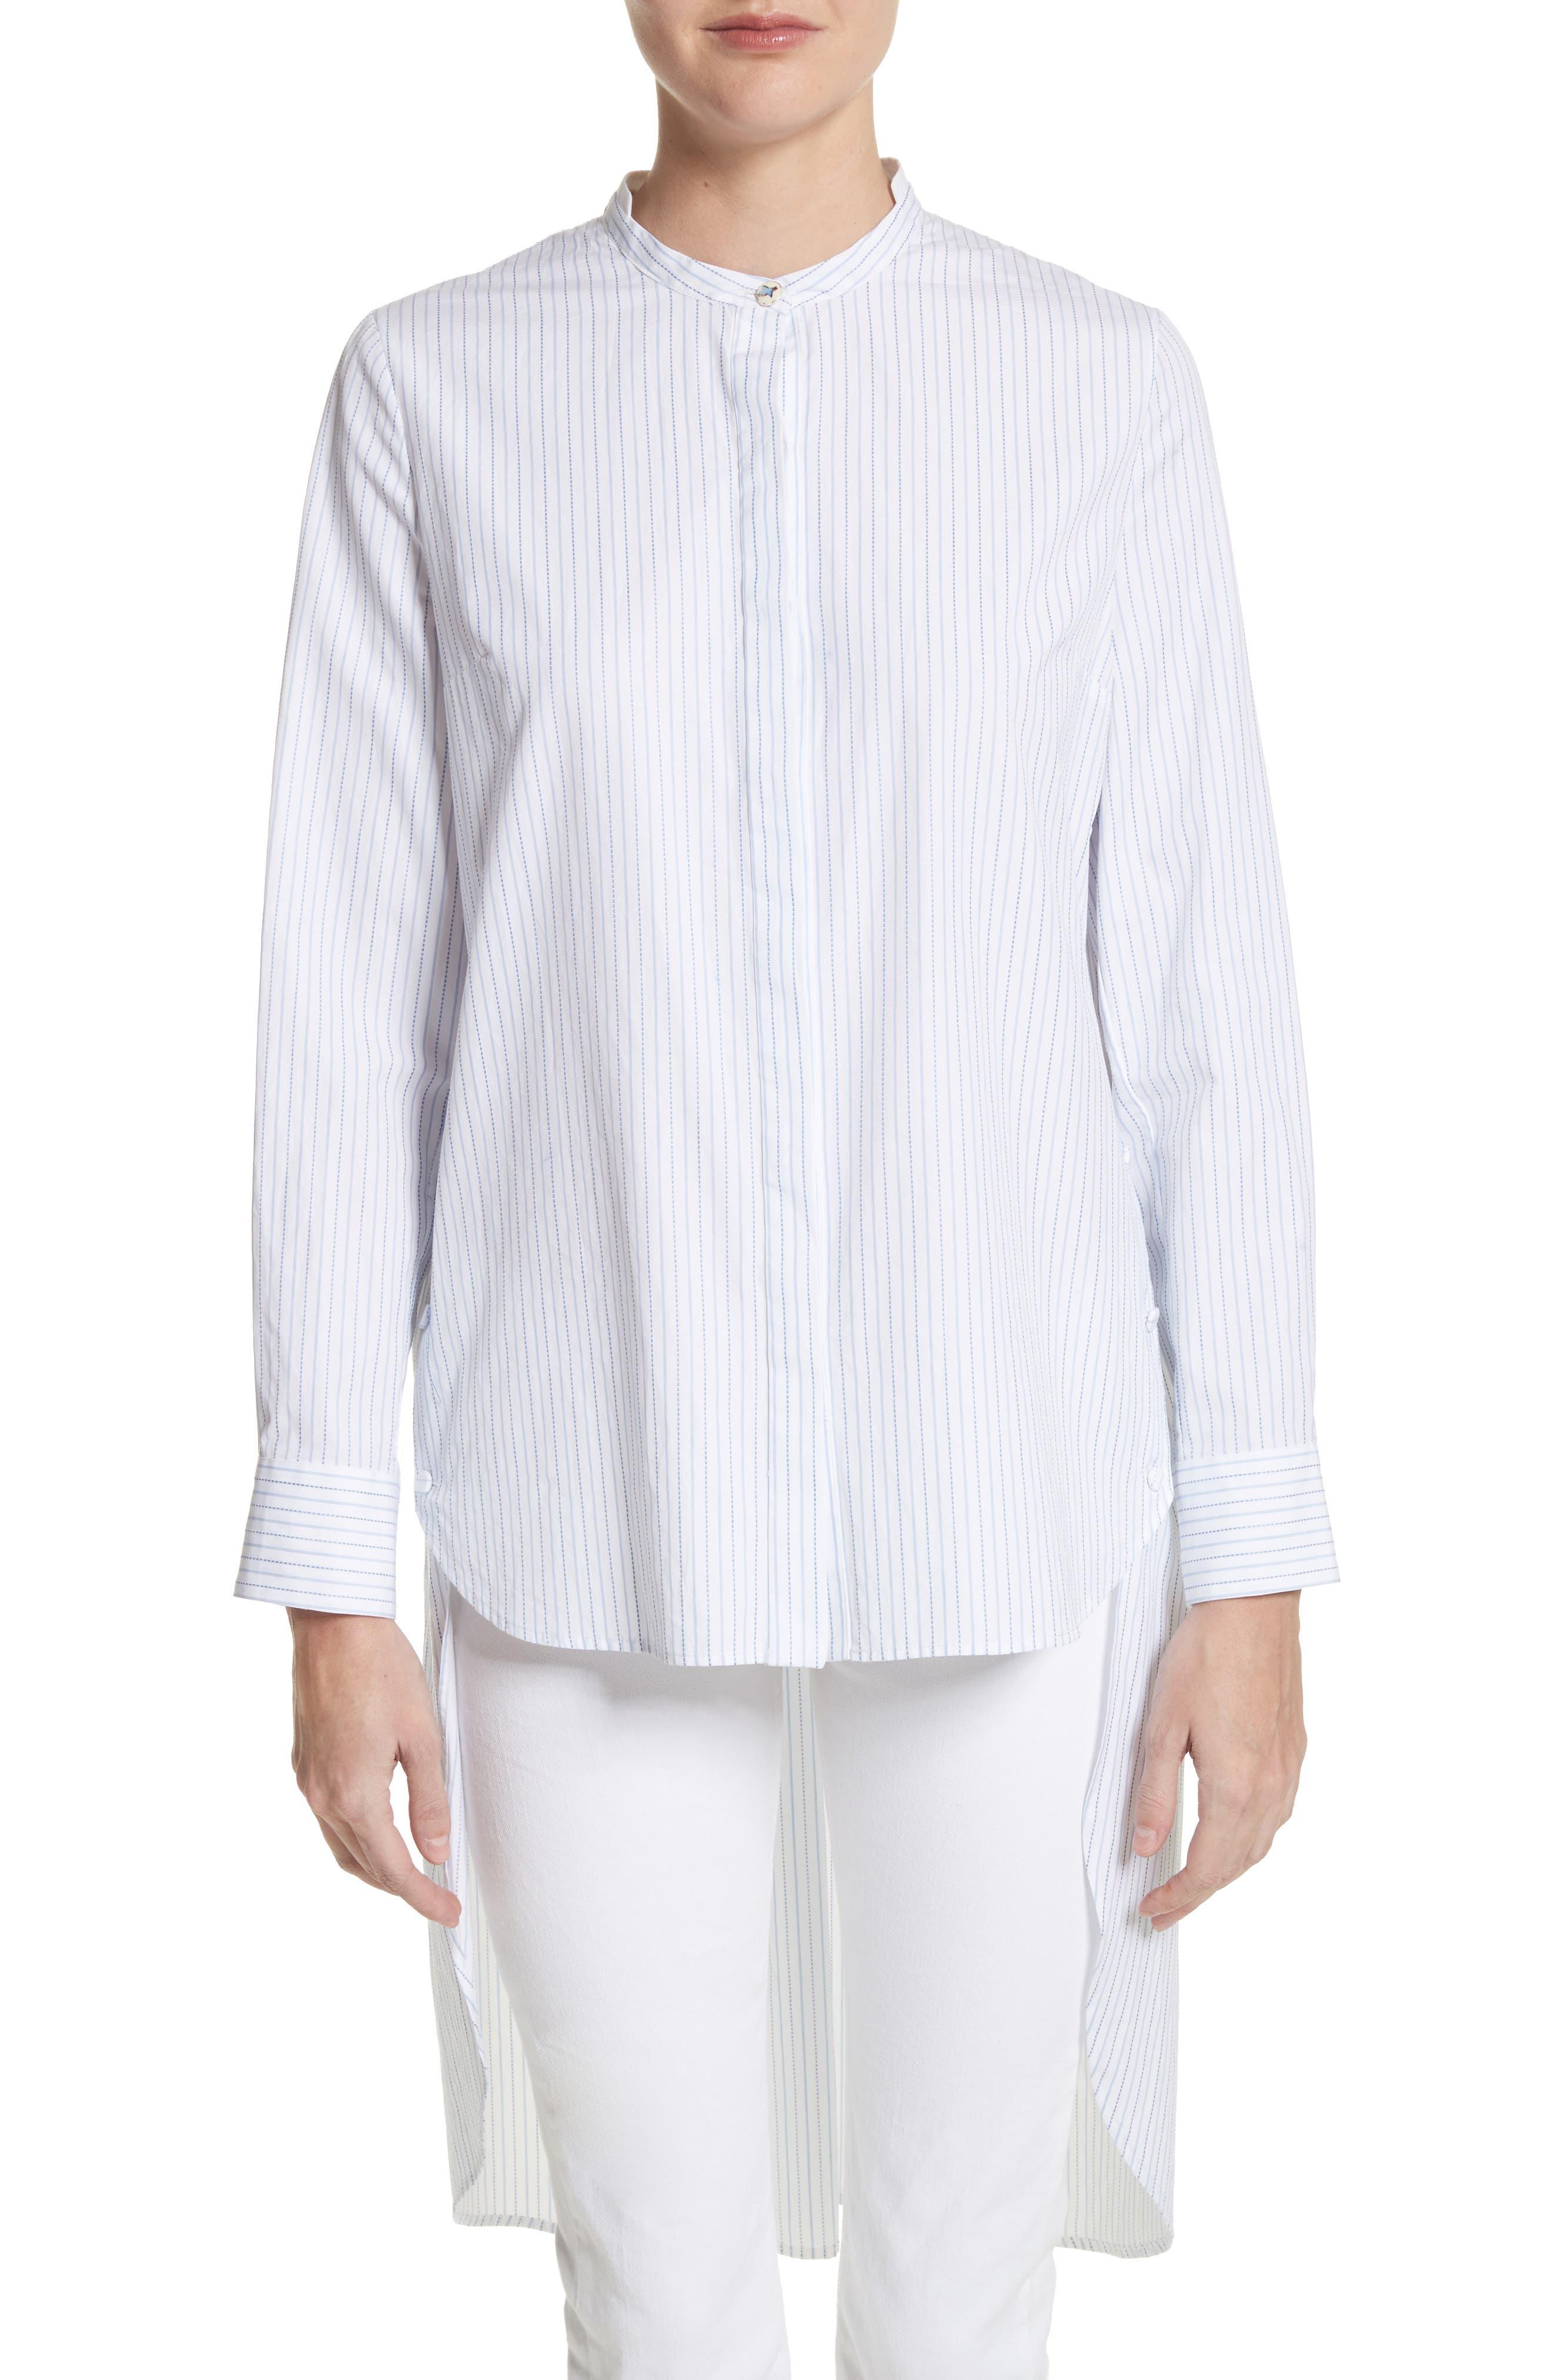 High/Low Stripe Cotton Poplin Shirt,                             Main thumbnail 1, color,                             White/ Blue